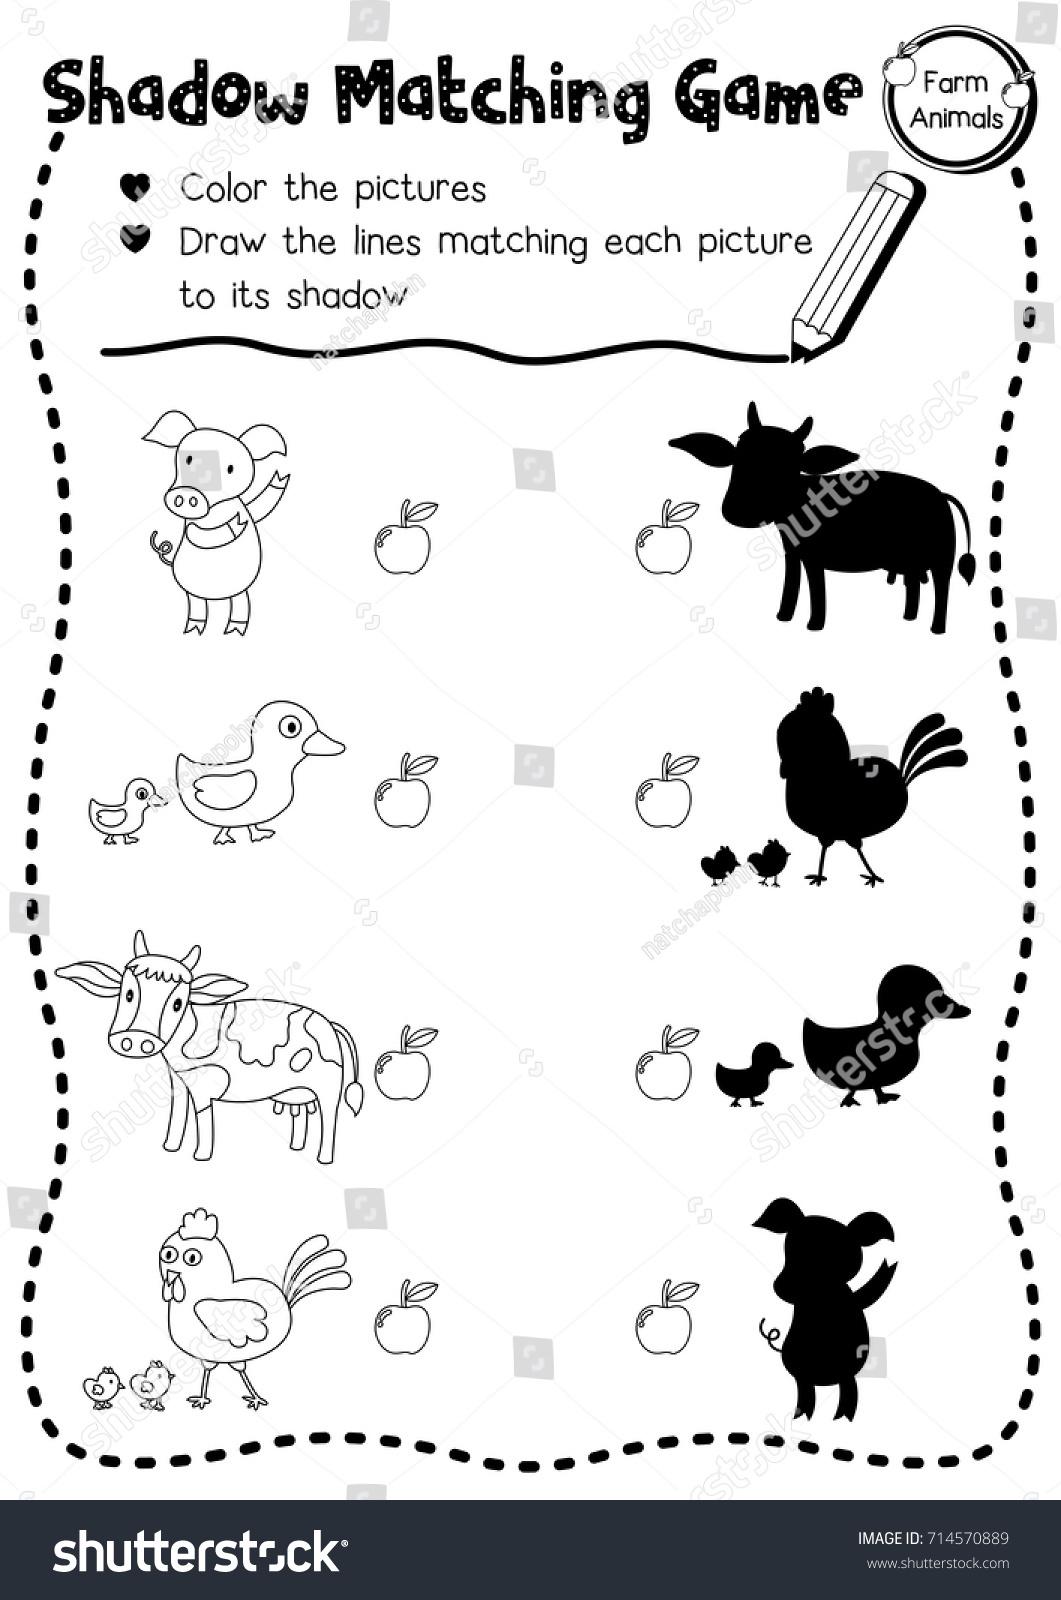 Shadow Matching Game Farm Animals Preschool Stock Vector Royalty